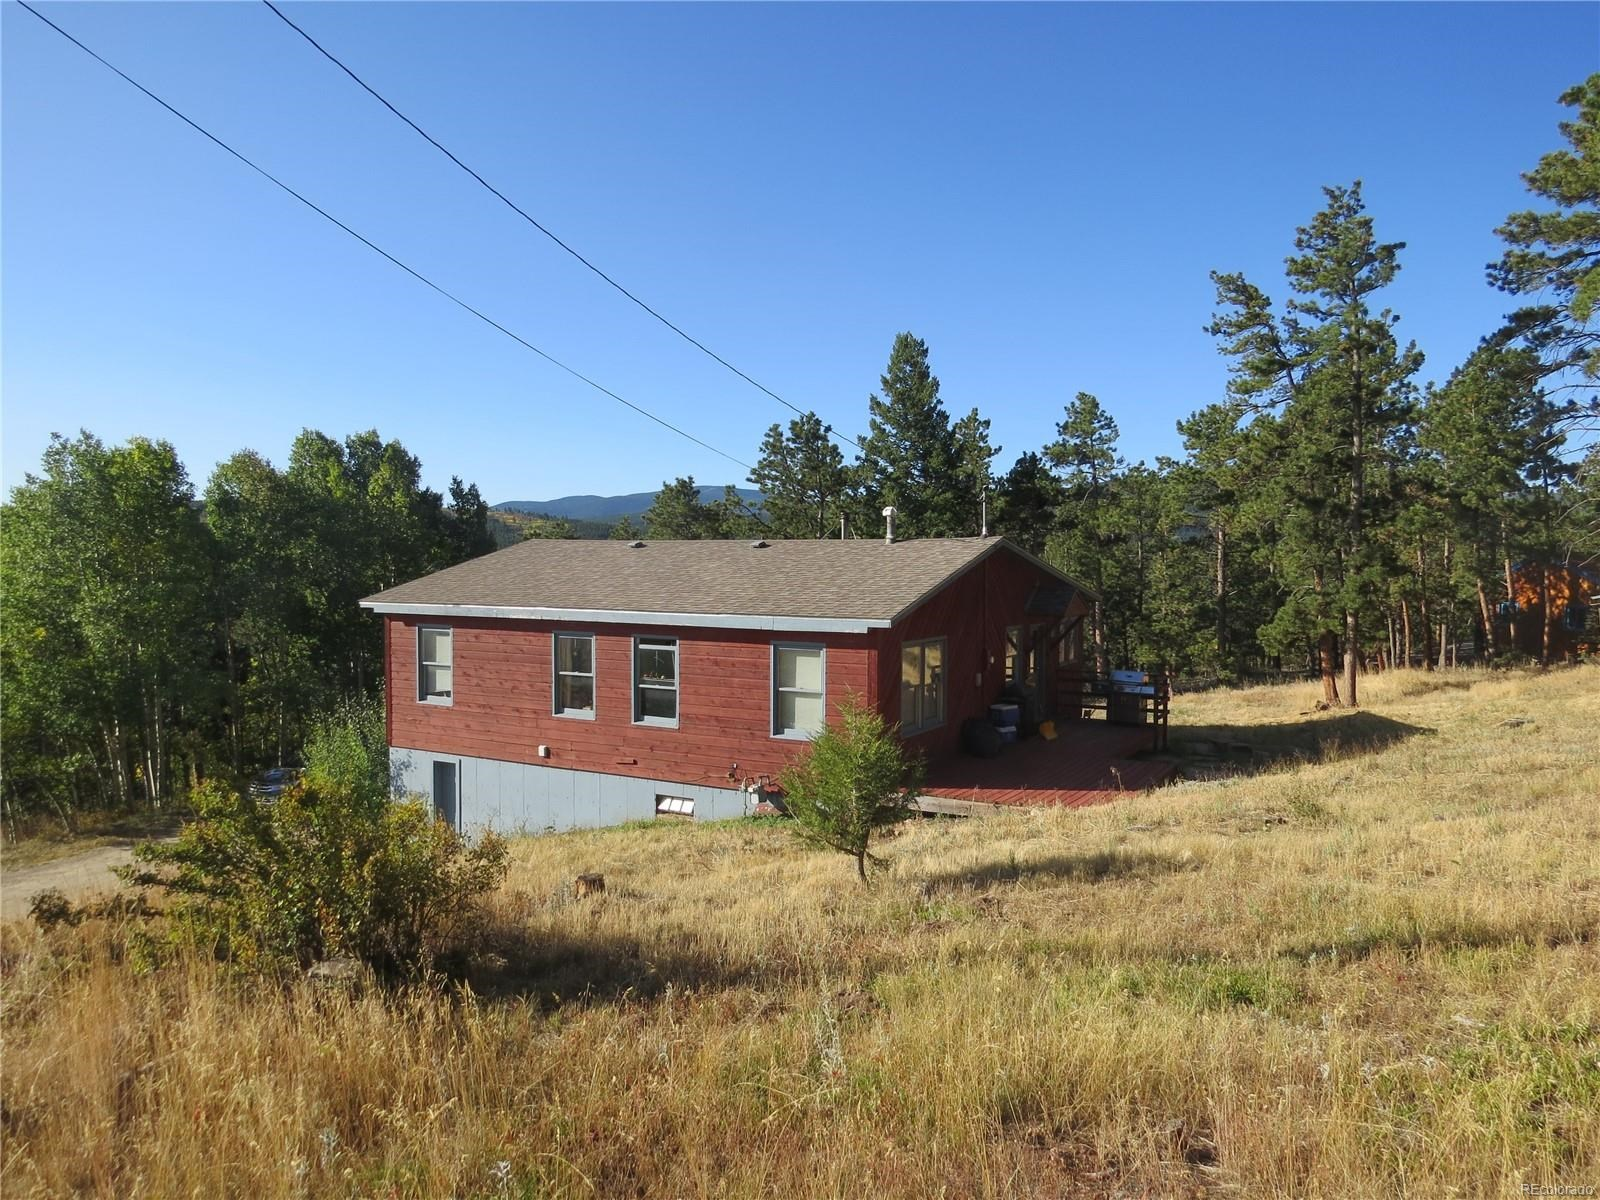 MLS# 9251839 - 4 - 50 Navajo Trail, Nederland, CO 80466